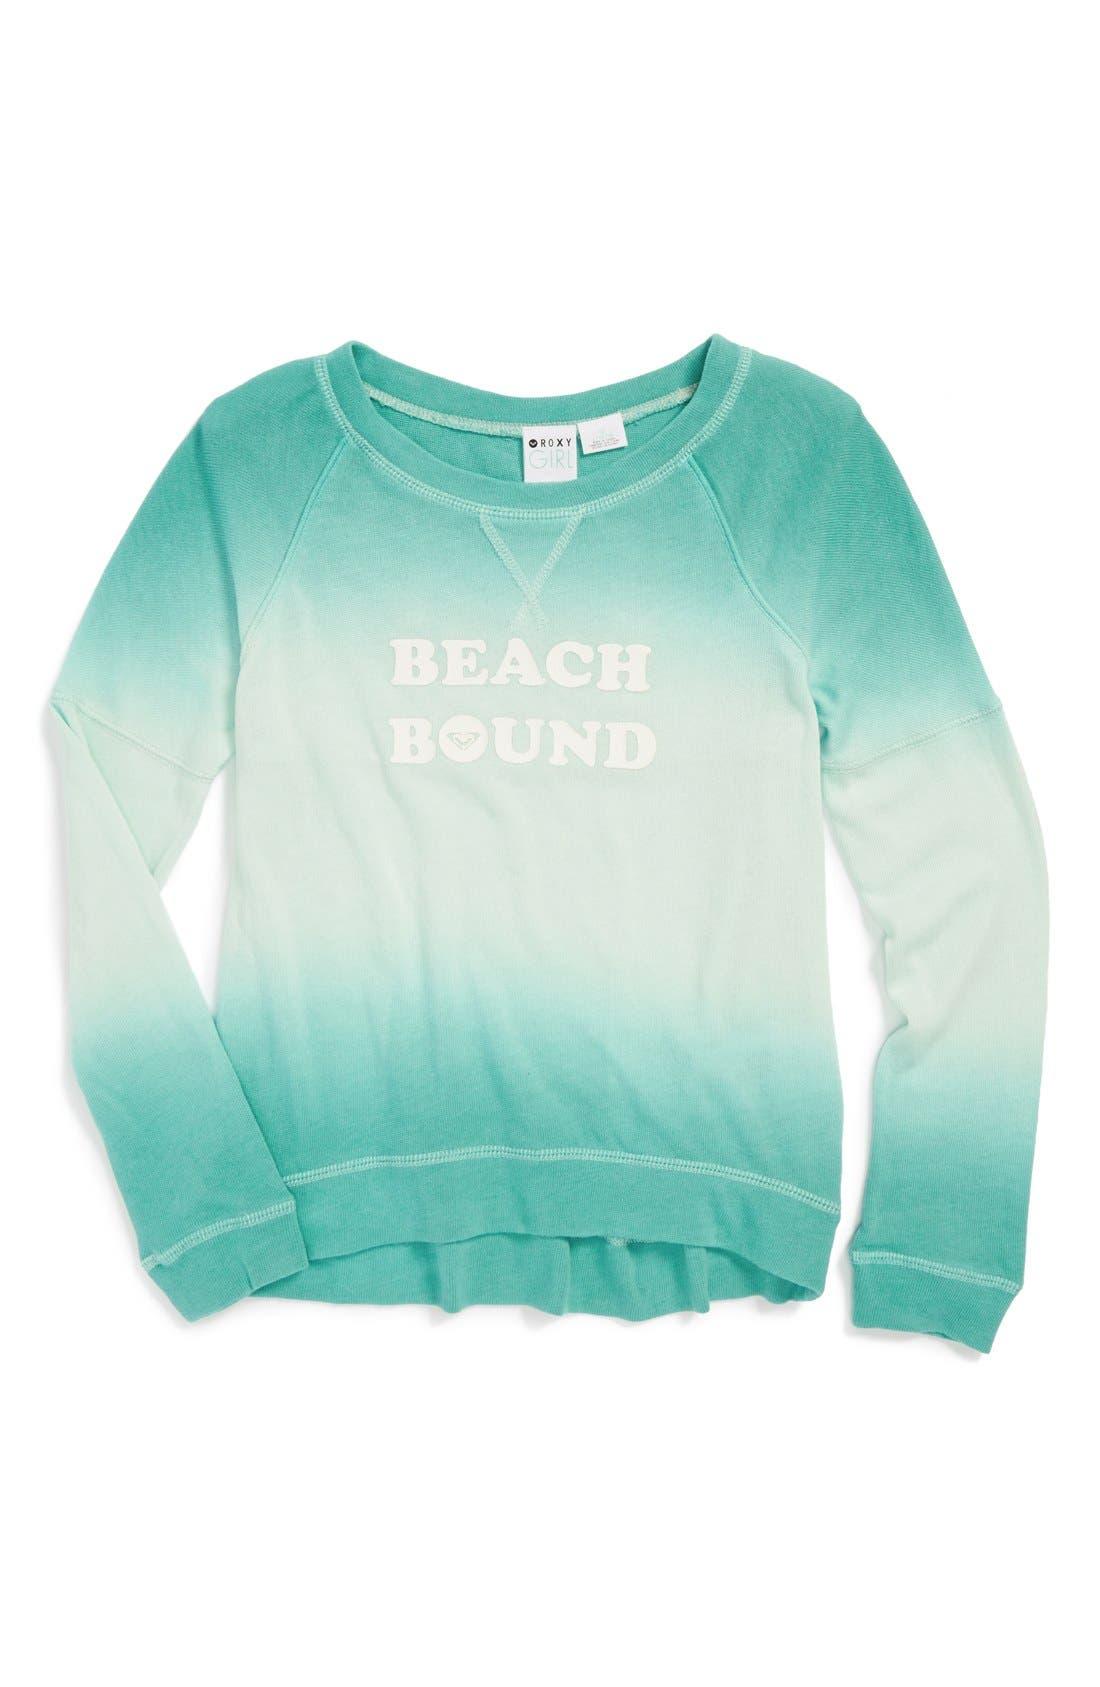 Alternate Image 1 Selected - Roxy 'Switch Up' Sweatshirt (Big Girls)